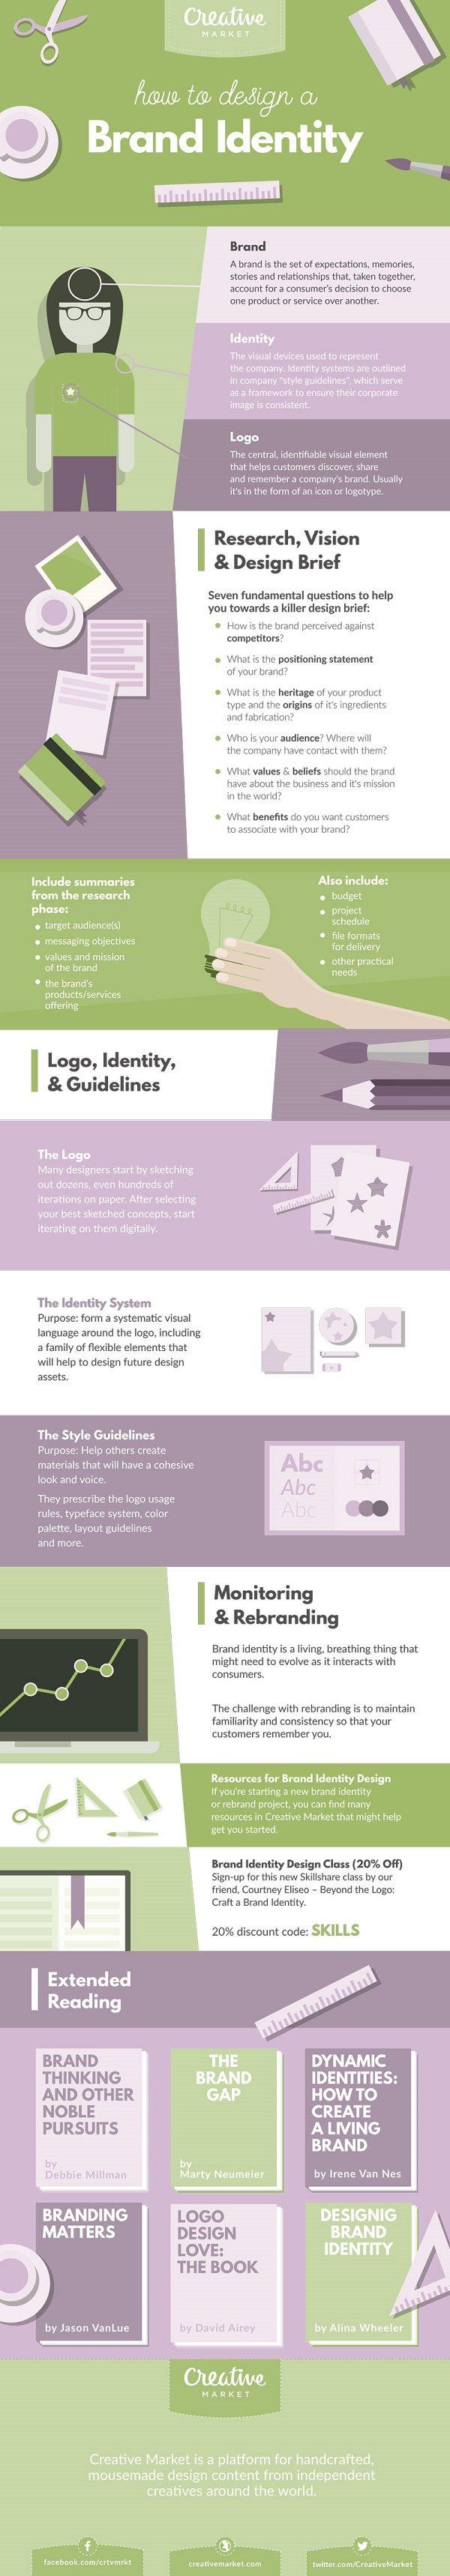 Infographic: How To Build A Visually Strong Brand Identity - DesignTAXI.com